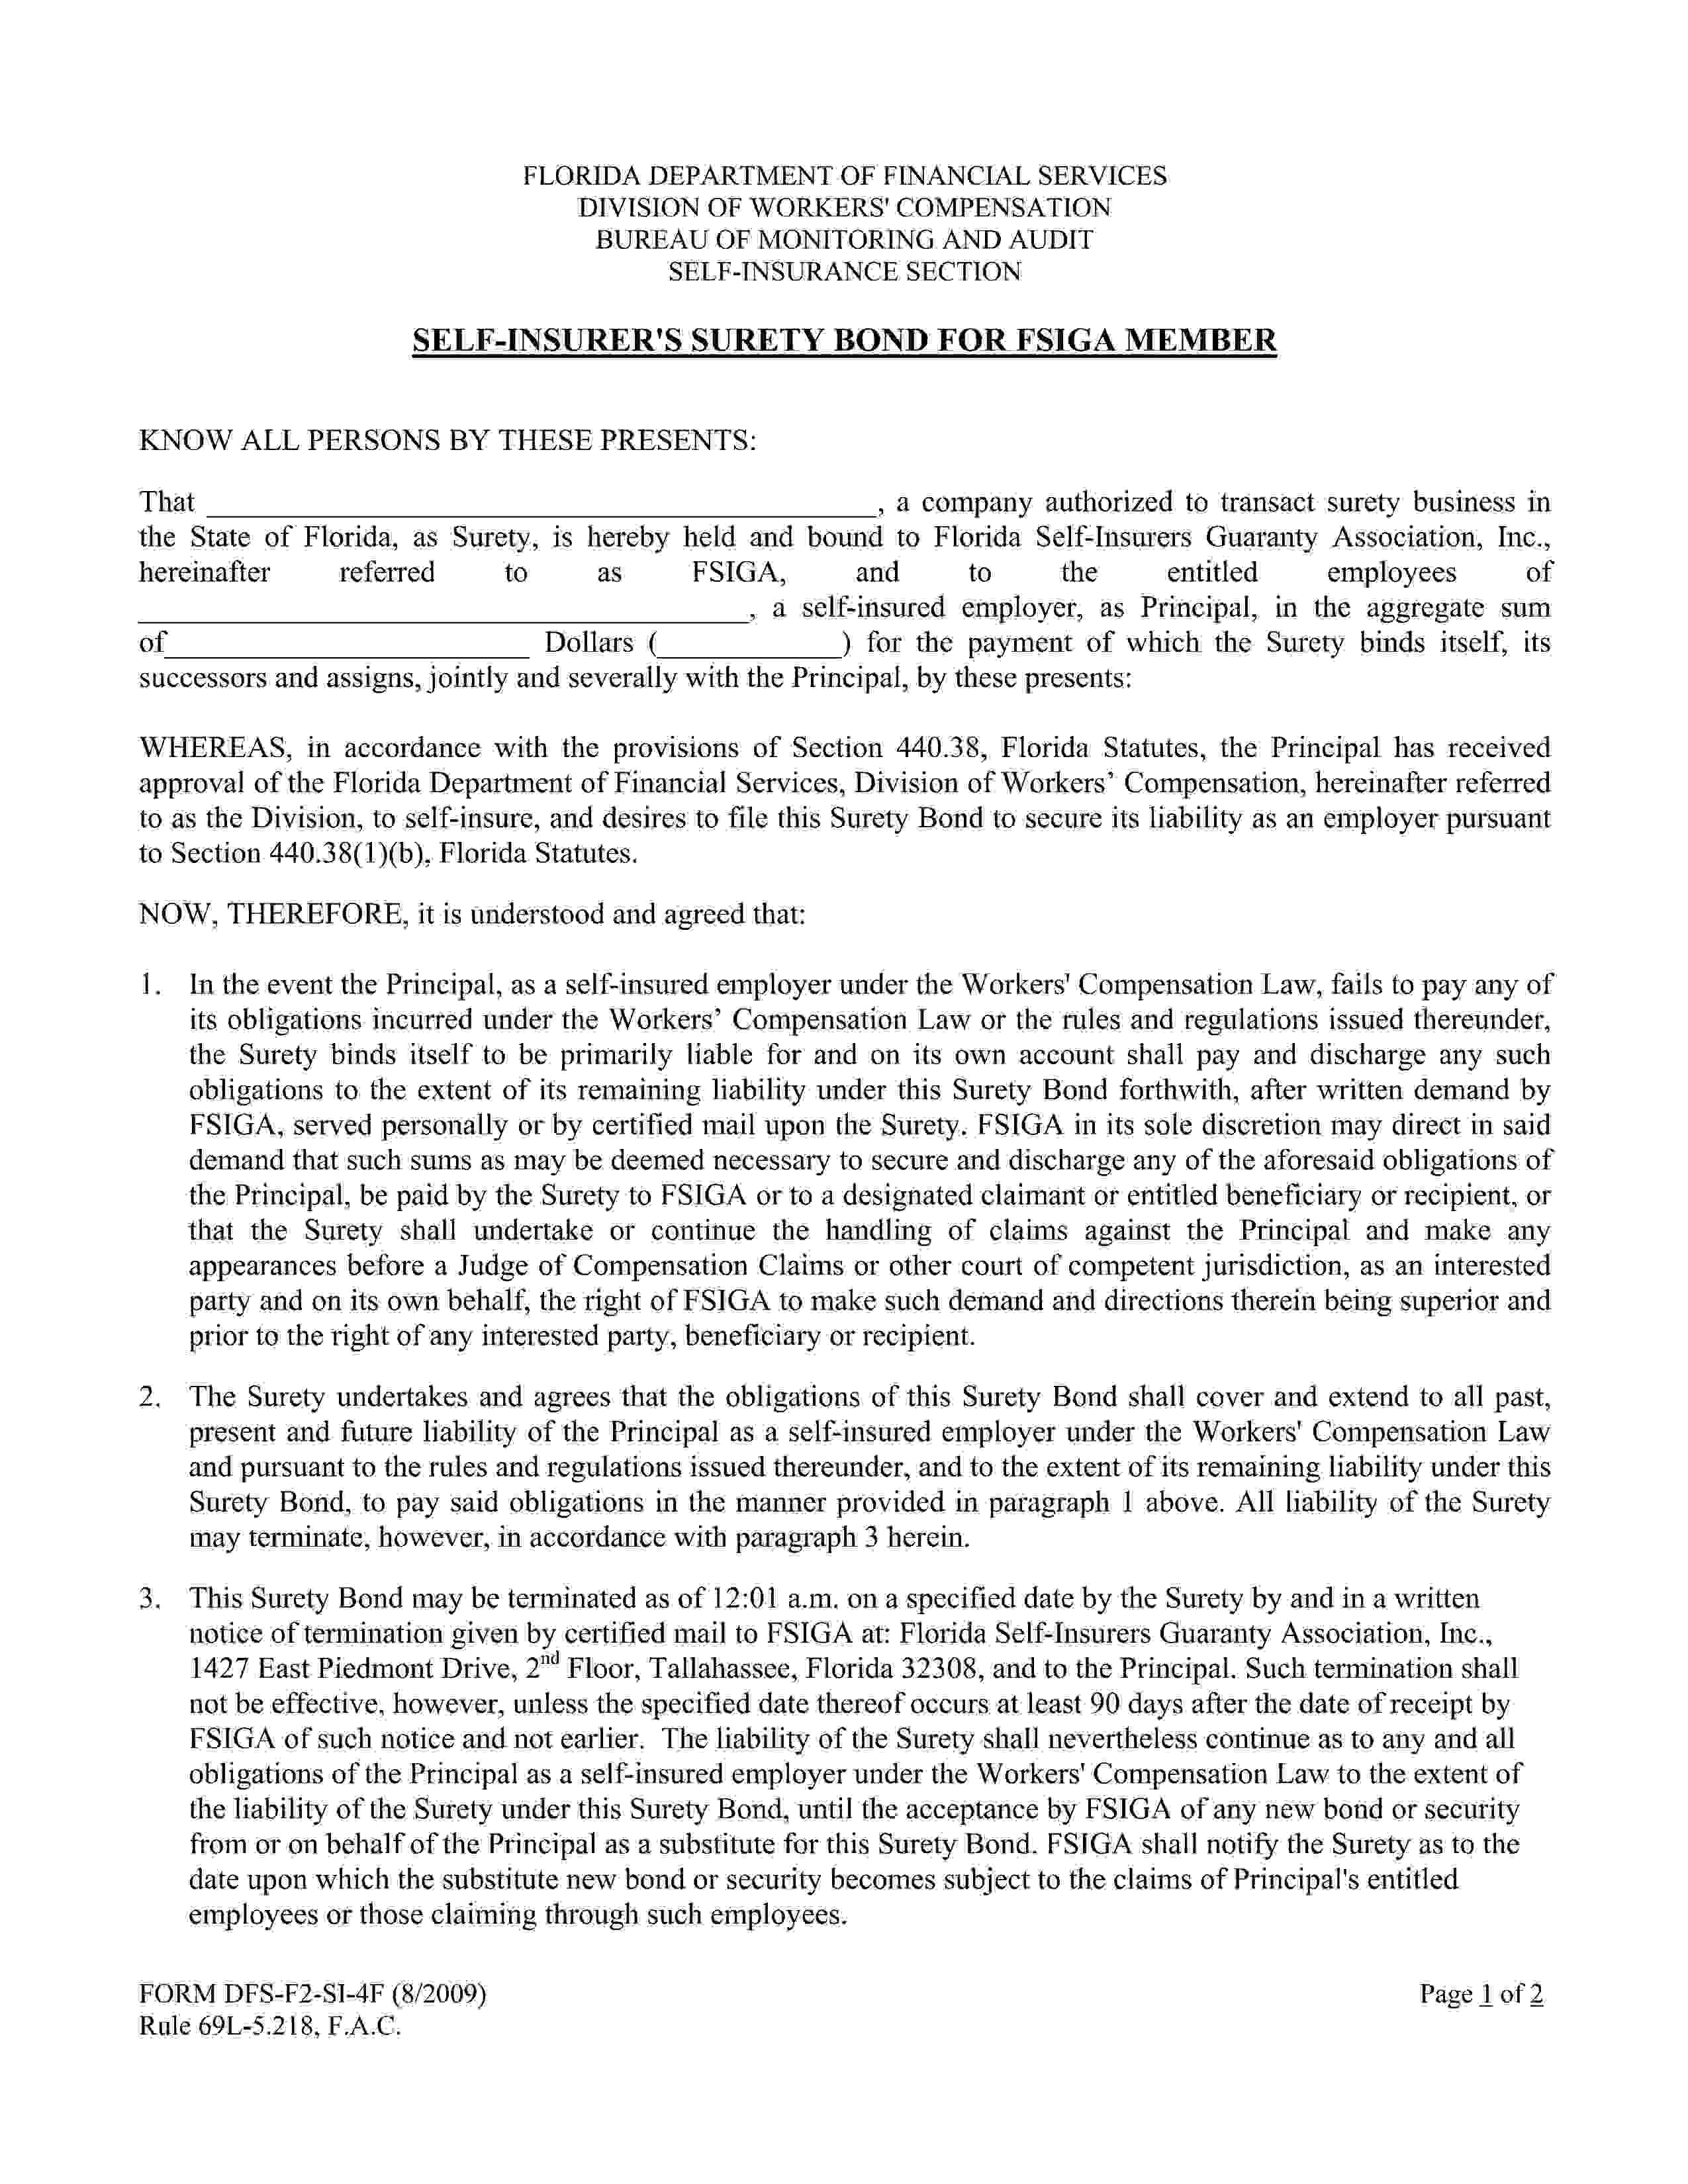 Florida Self-Insurers Guaranty Association, Inc. Workers' Compensation Self Insurer Bond sample image